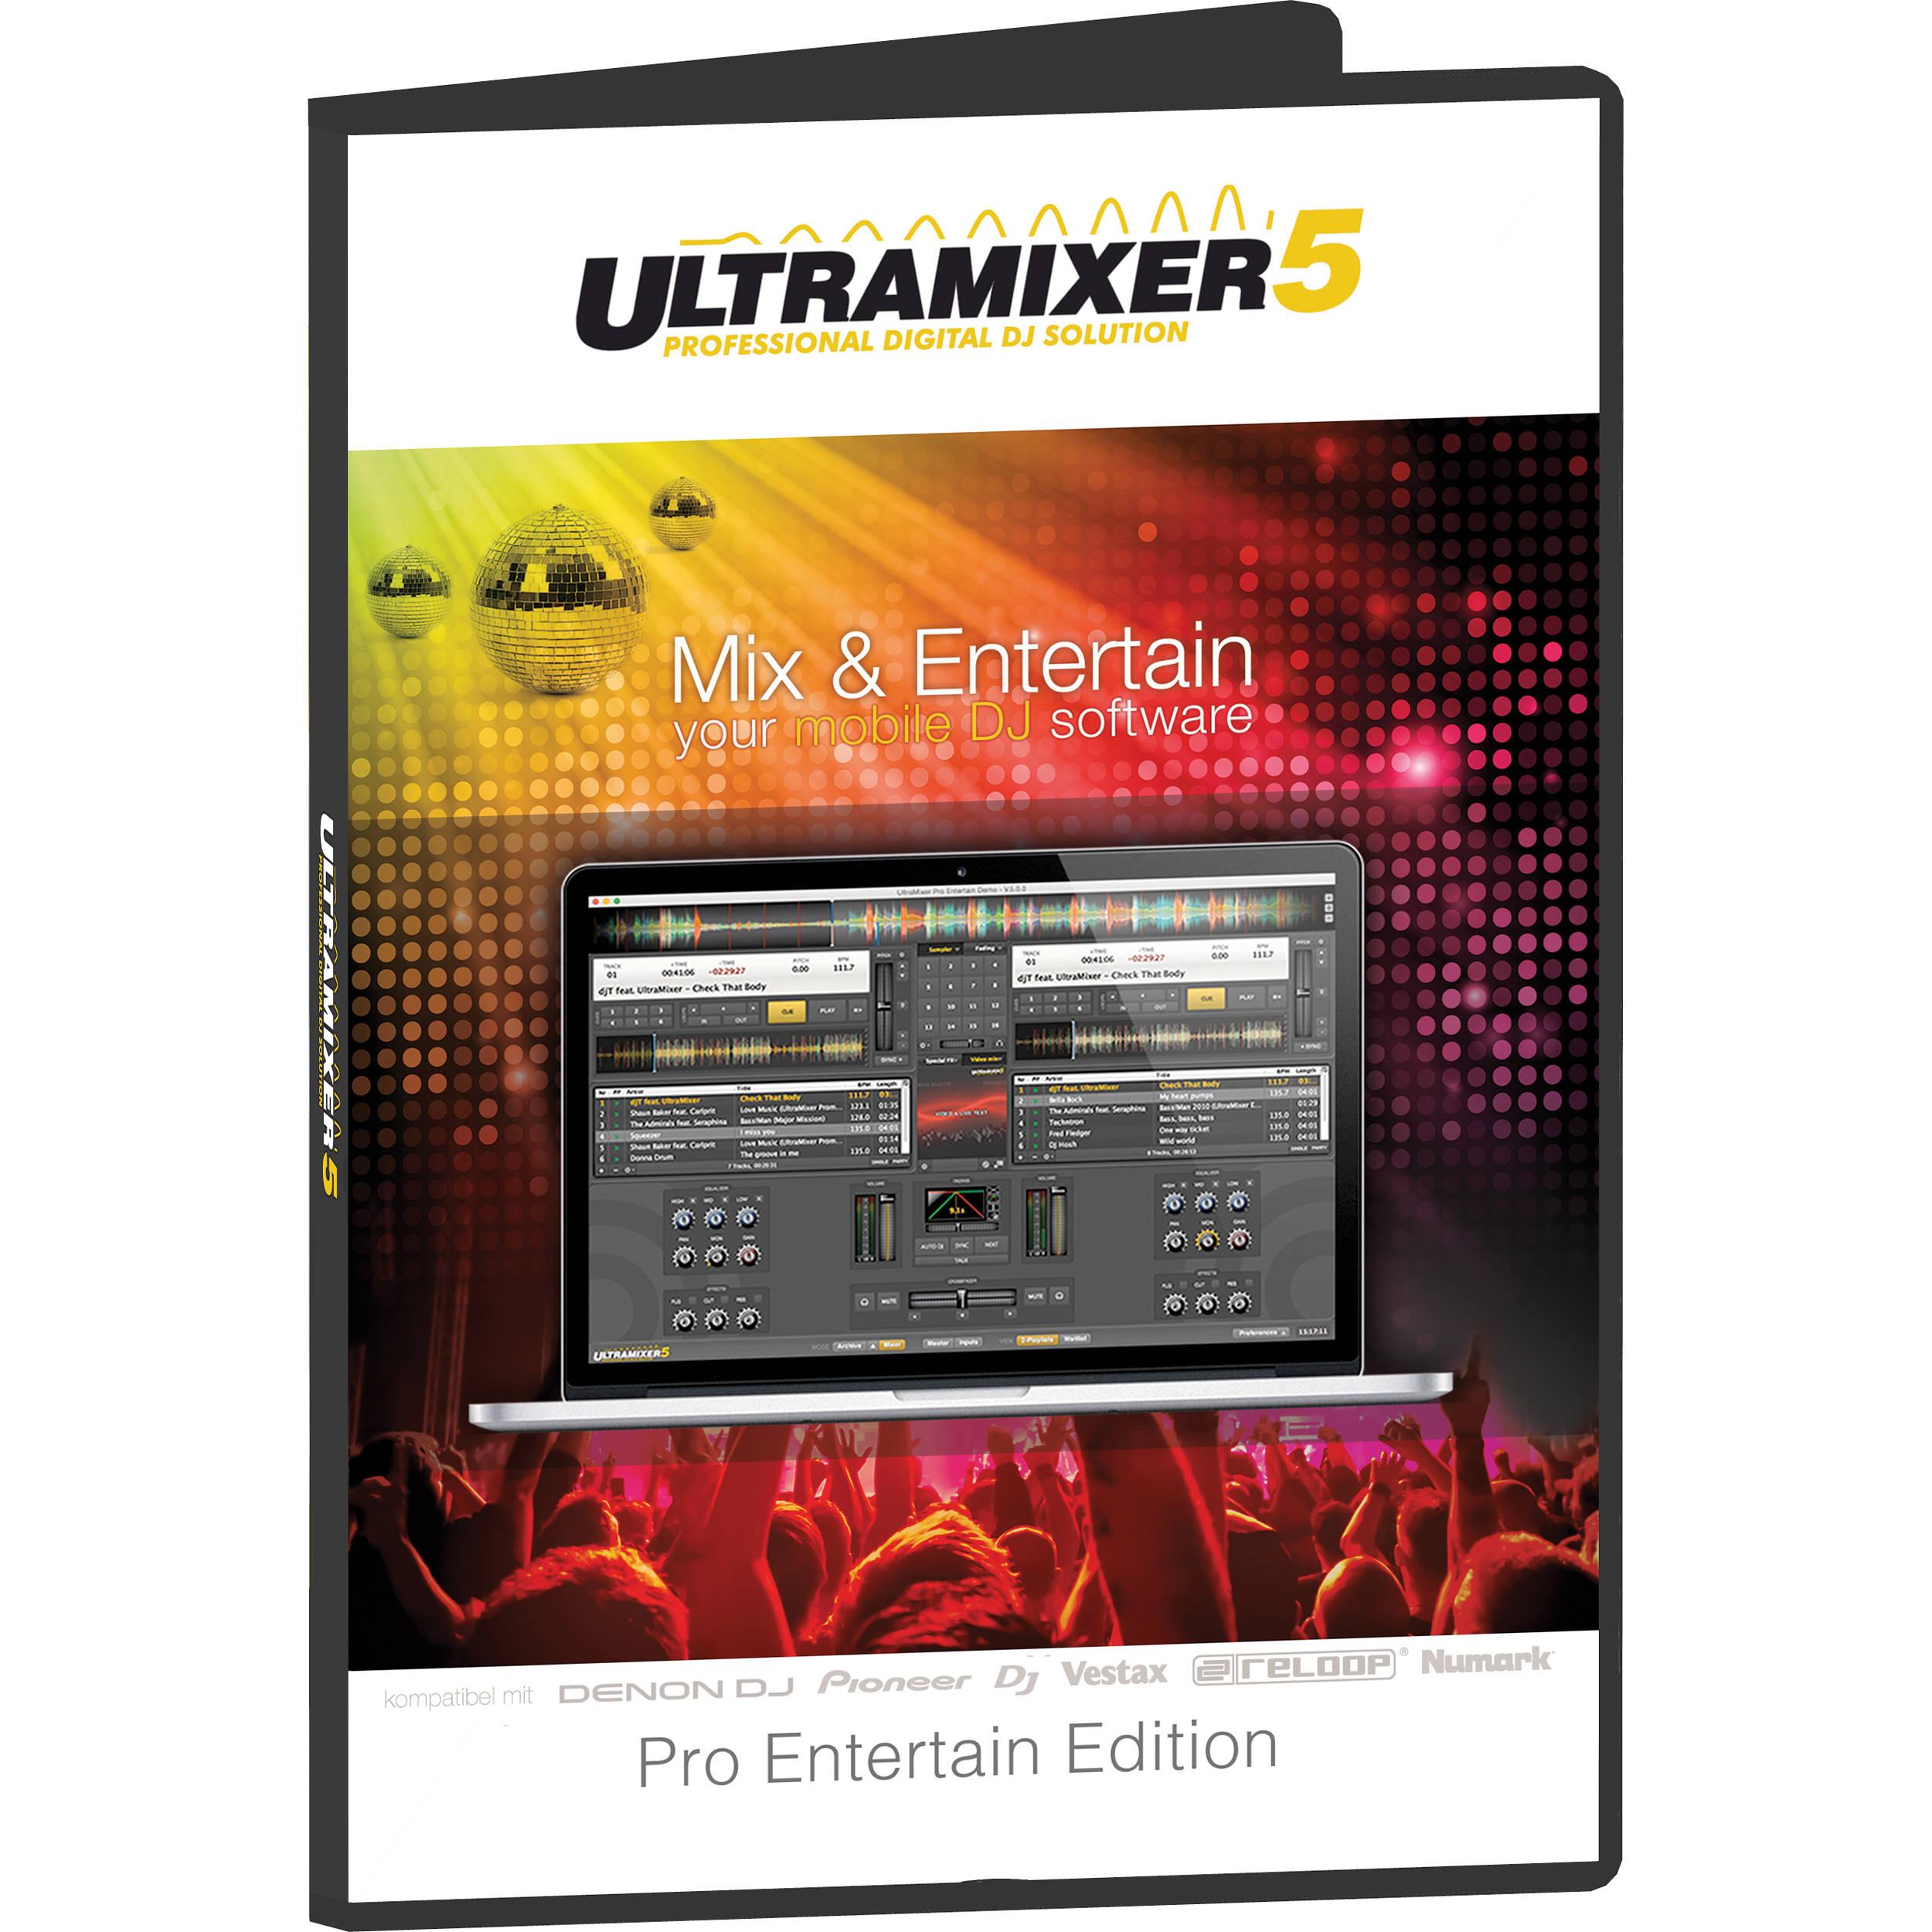 Trakaxpc 3.01.1 With Serial Crack Keygen.rar ultramixer_um_pe5m_pro_dj_software_for_1140396